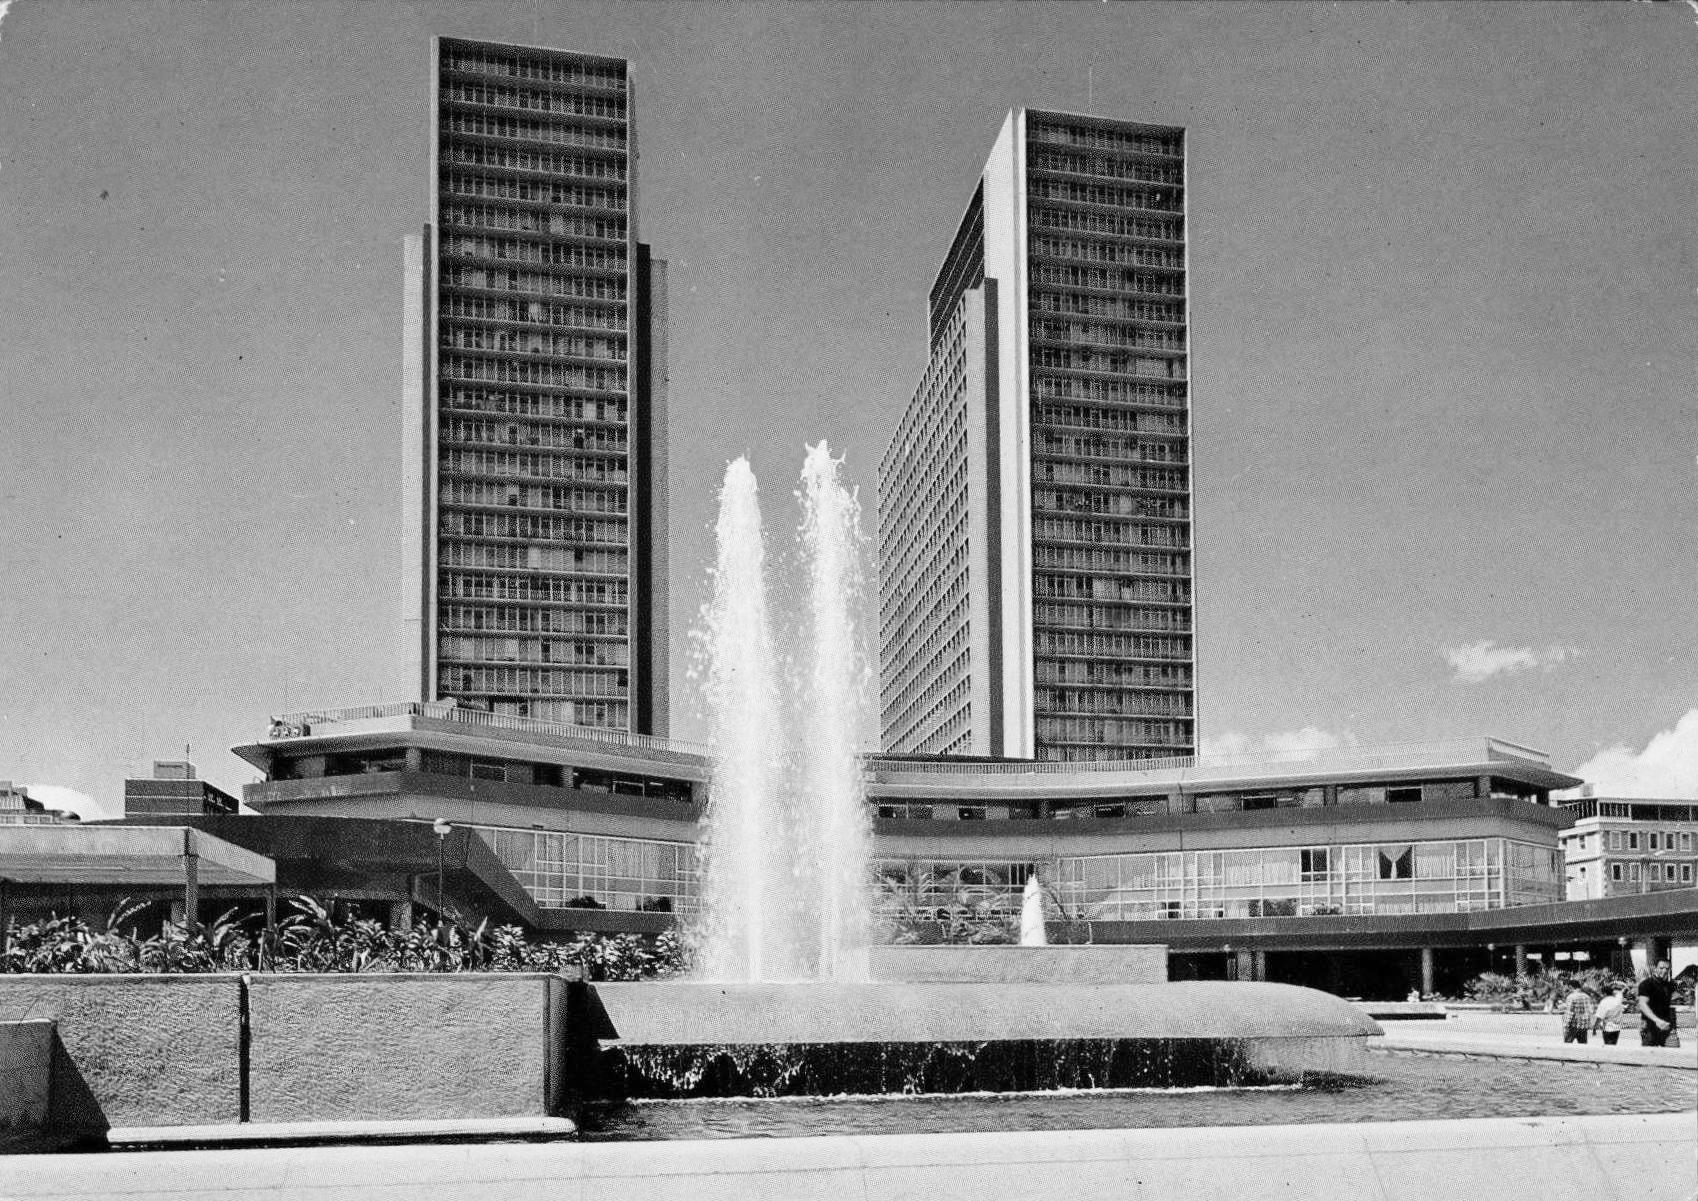 Ad classics torres de el silencio cipriano dom nguez for Plataforma de arquitectura